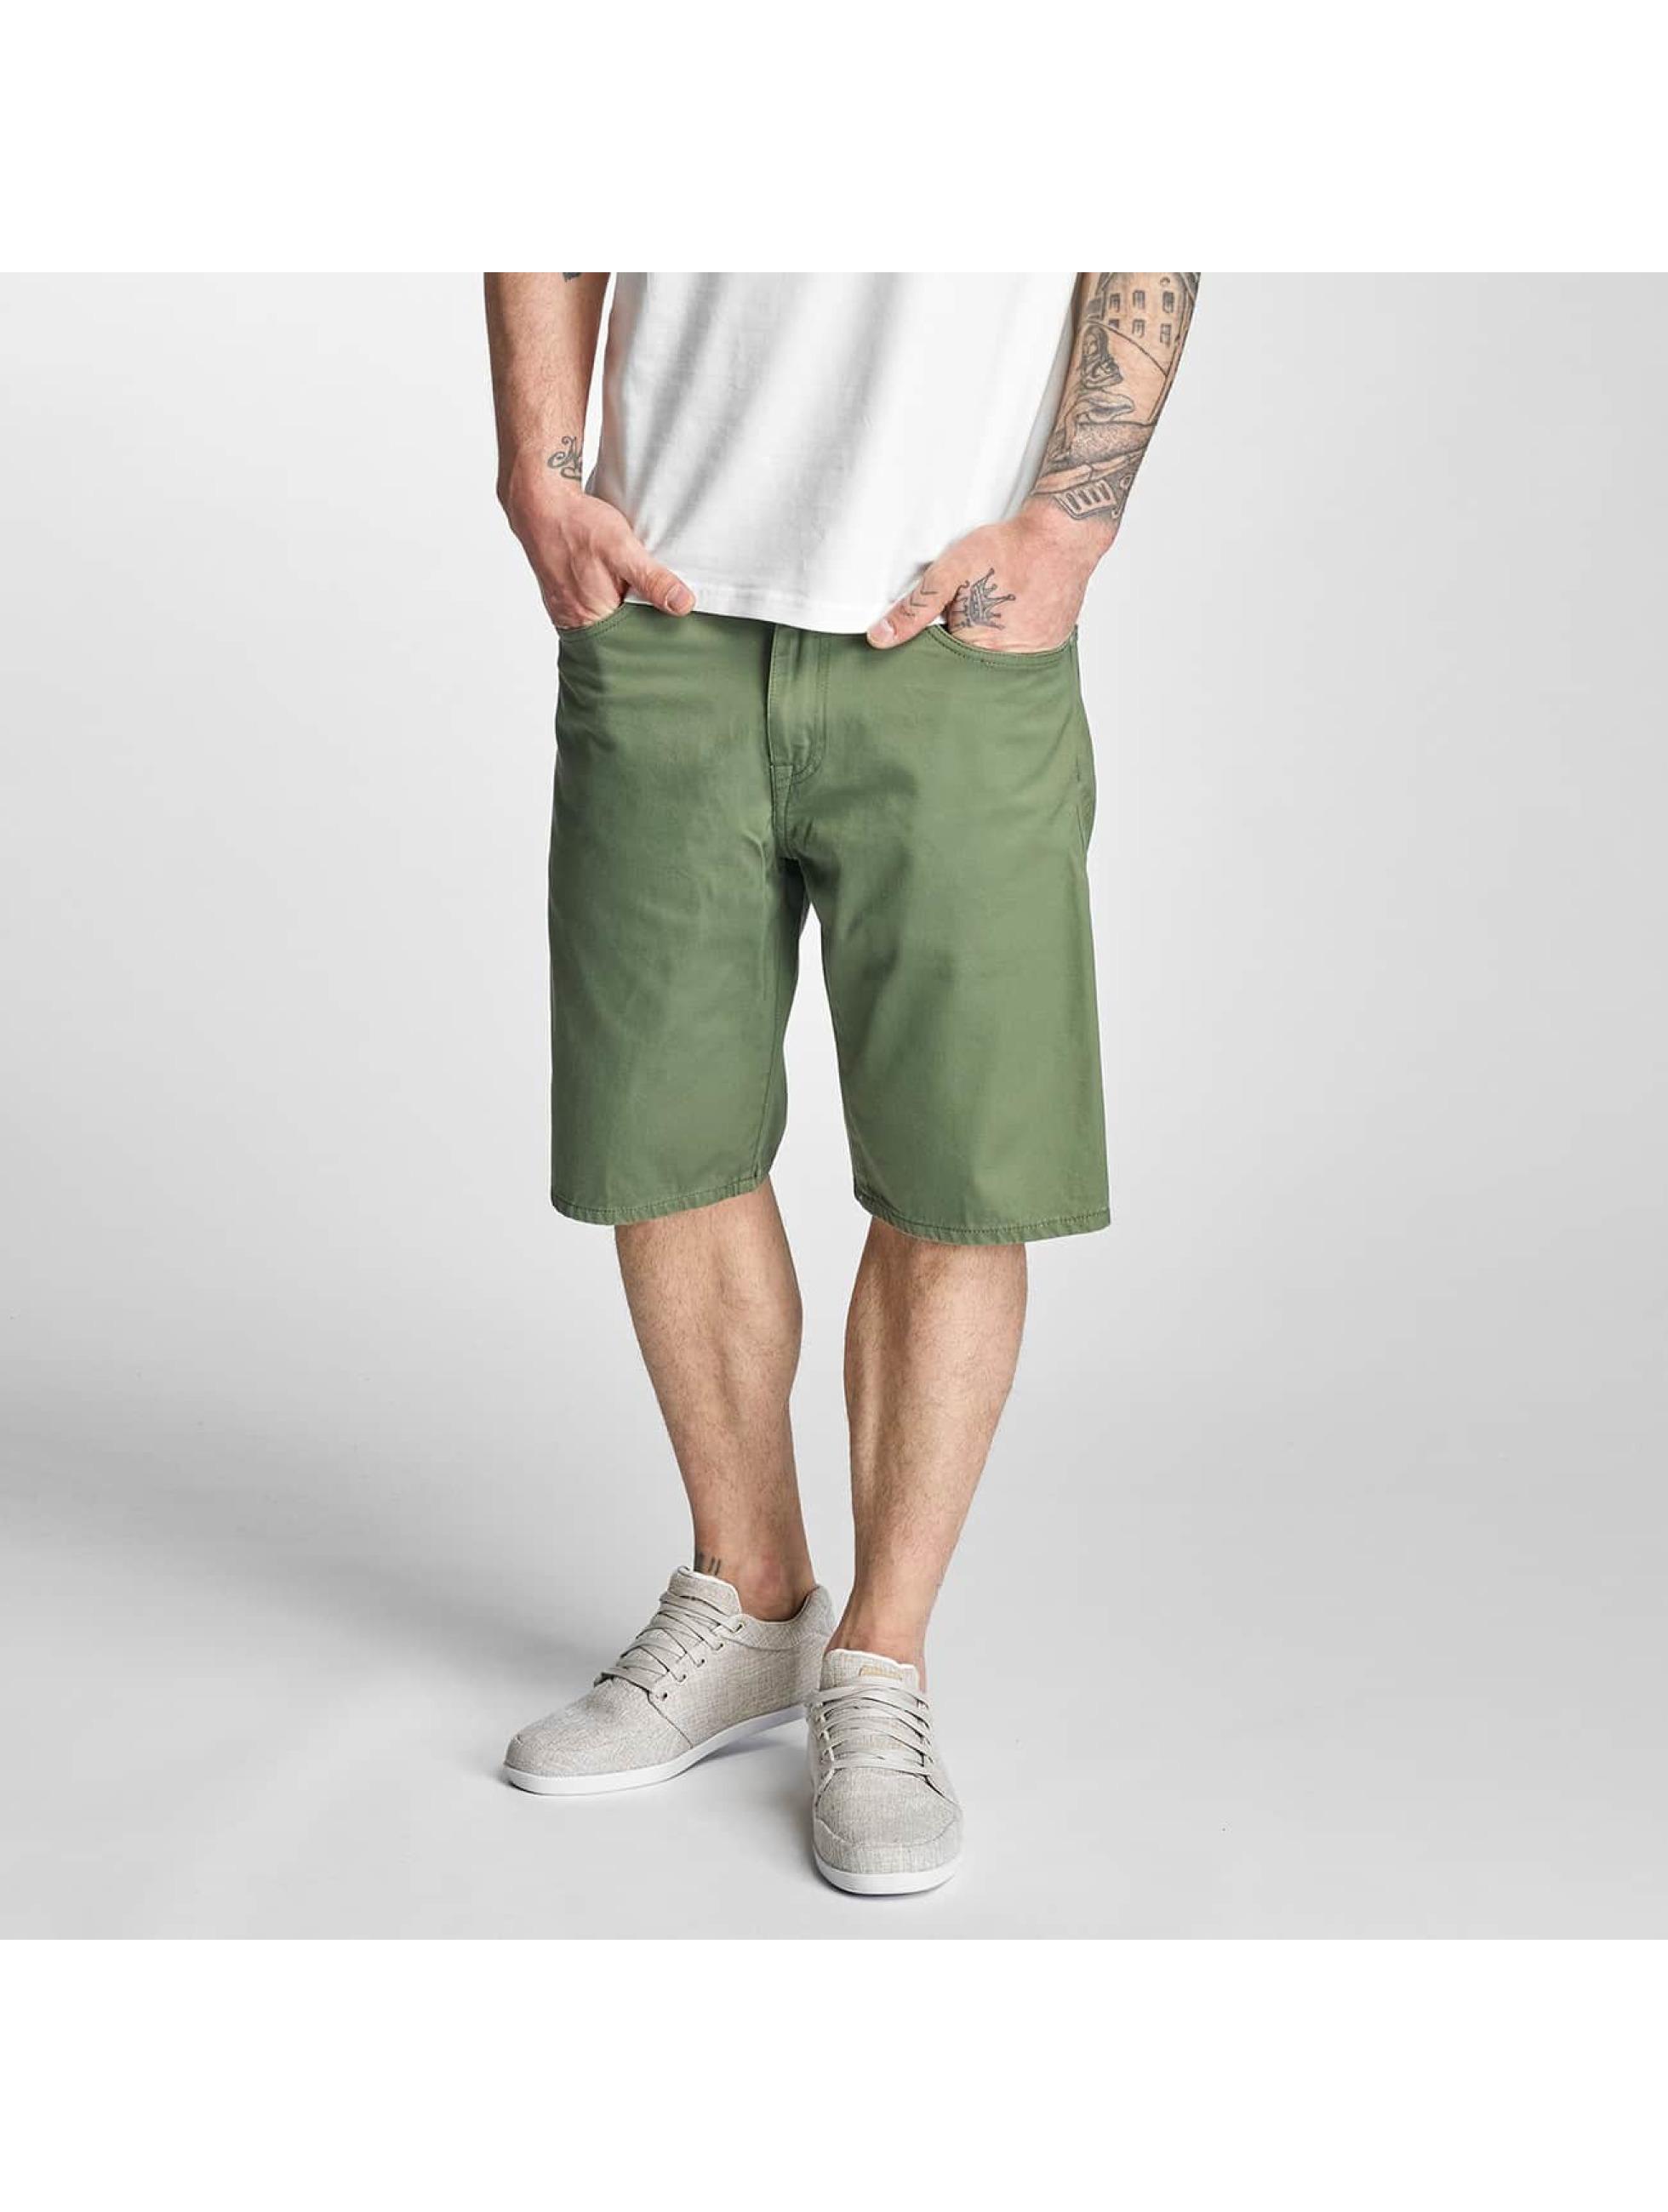 Carhartt WIP Männer Shorts Davies in grün